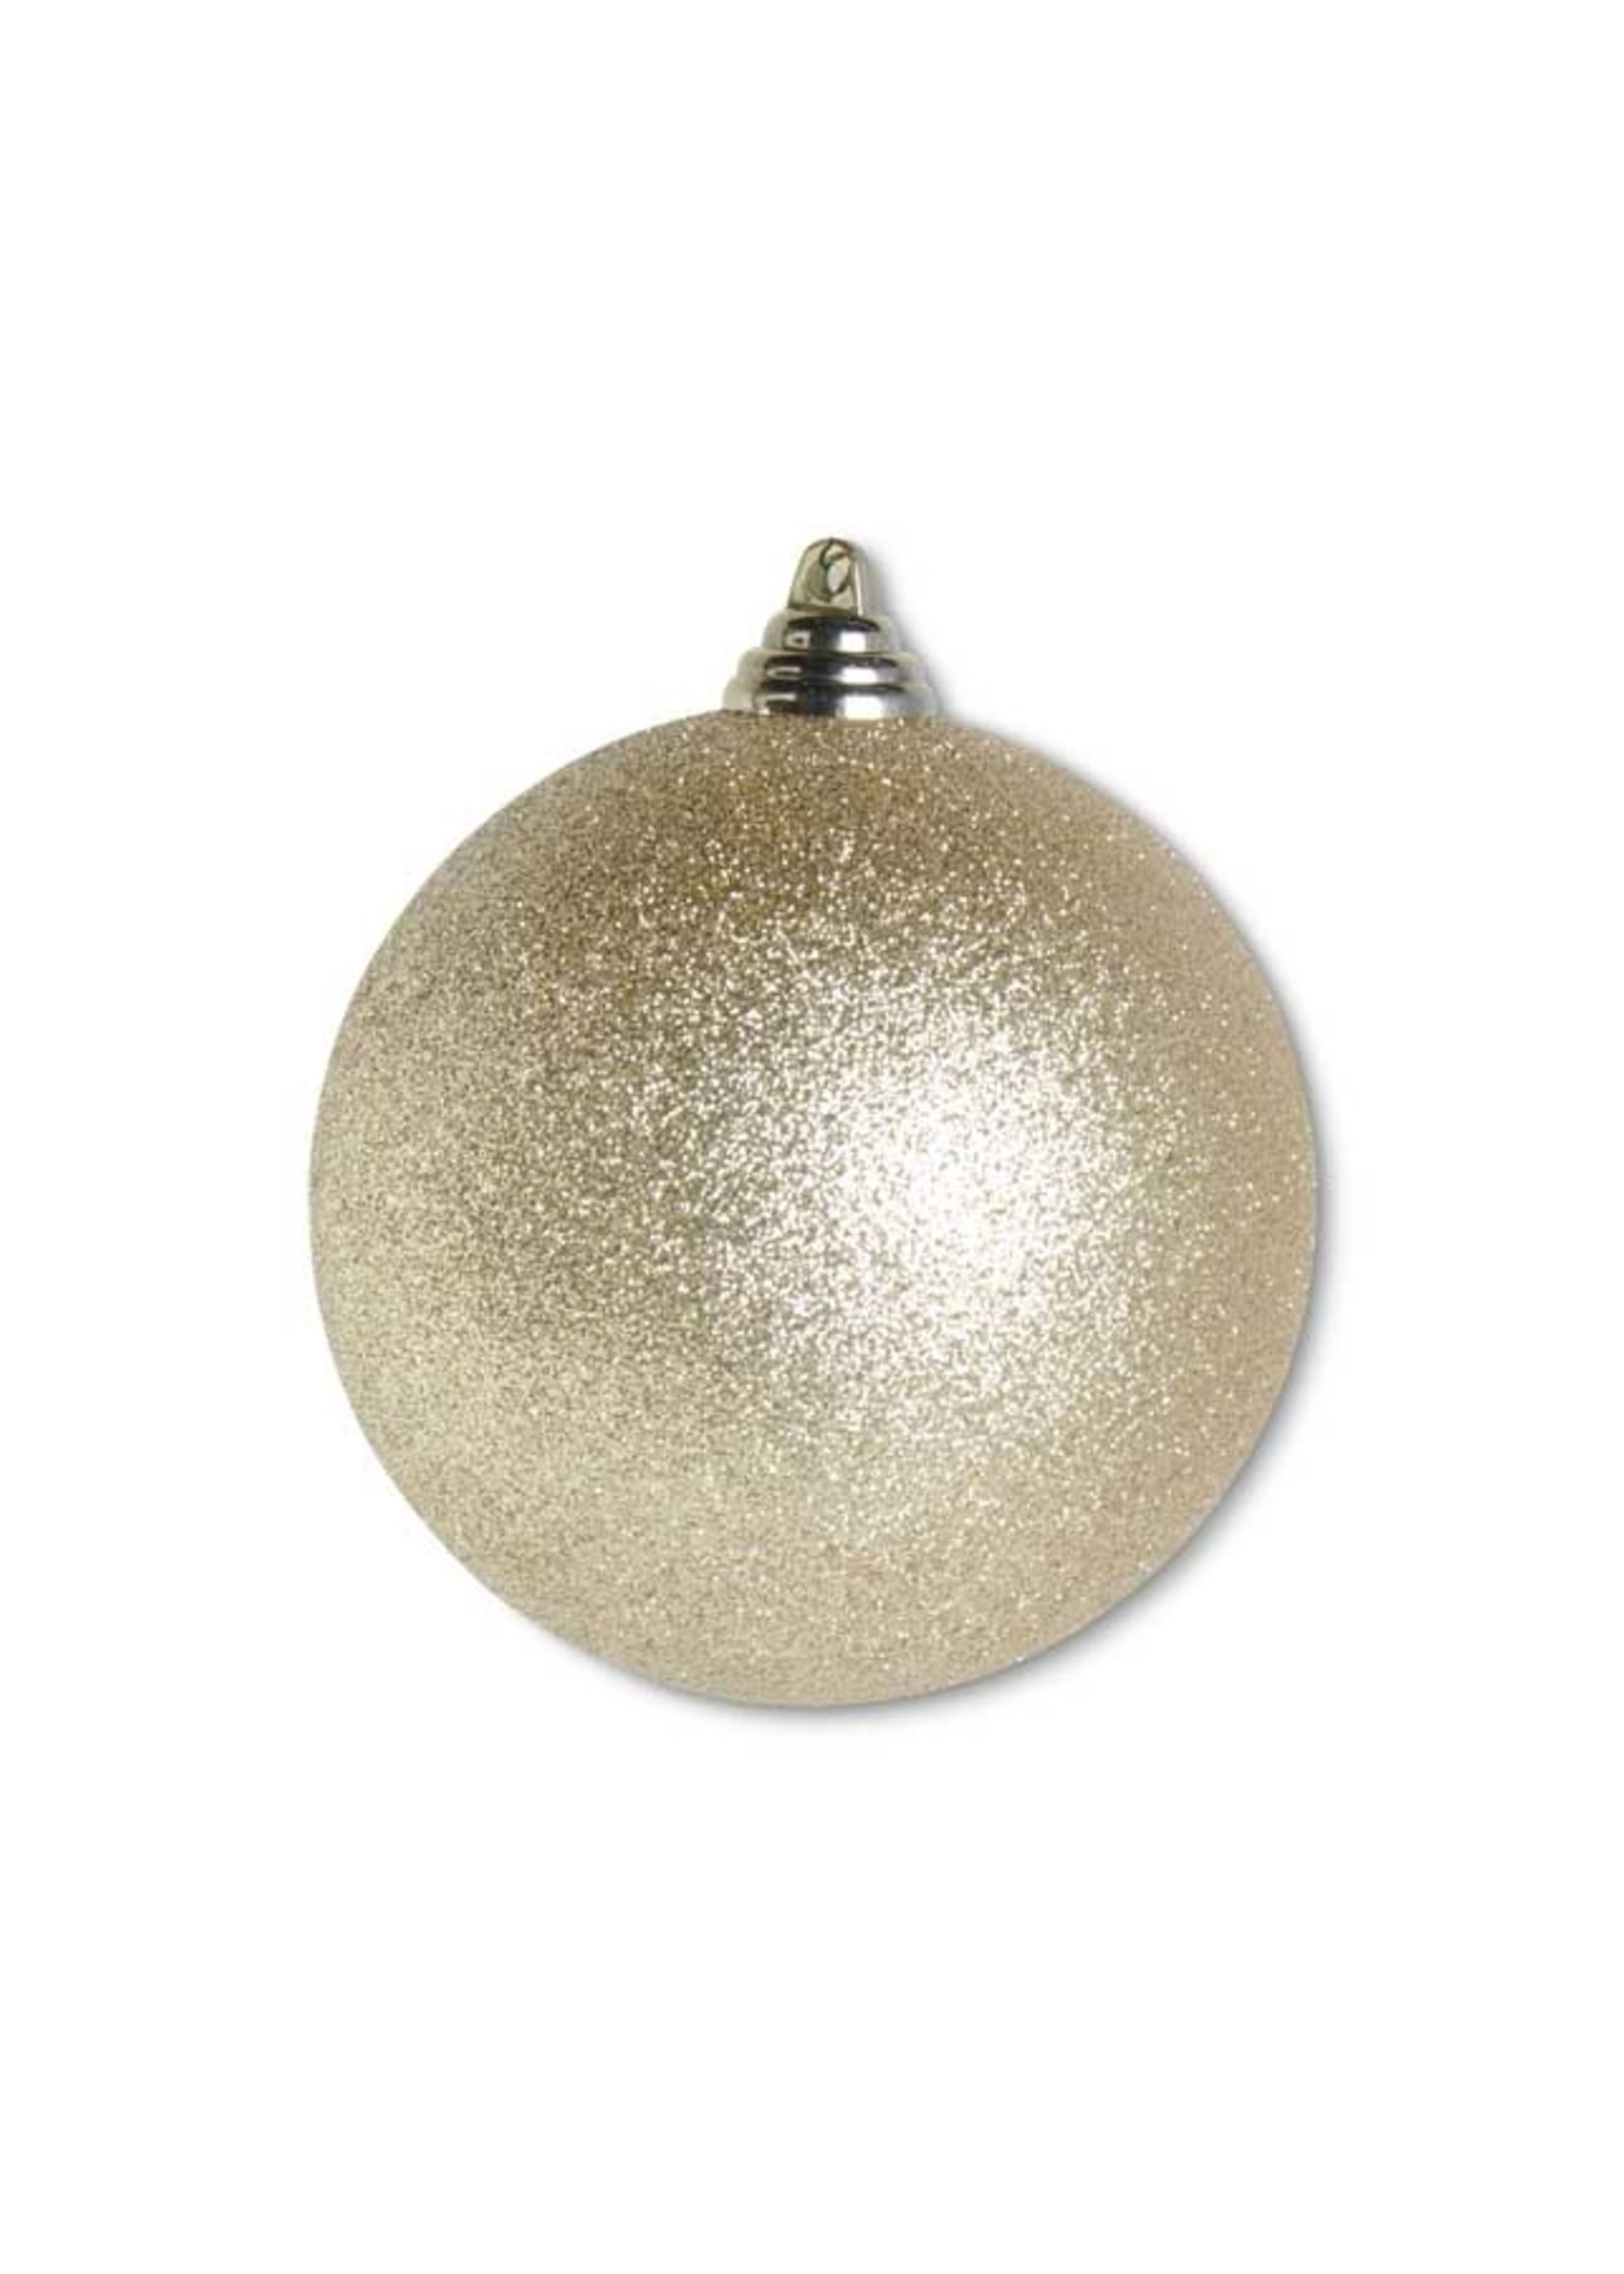 "K & K Interiors 4.5"" Gold Glittered Shatterproof Round Ornament"